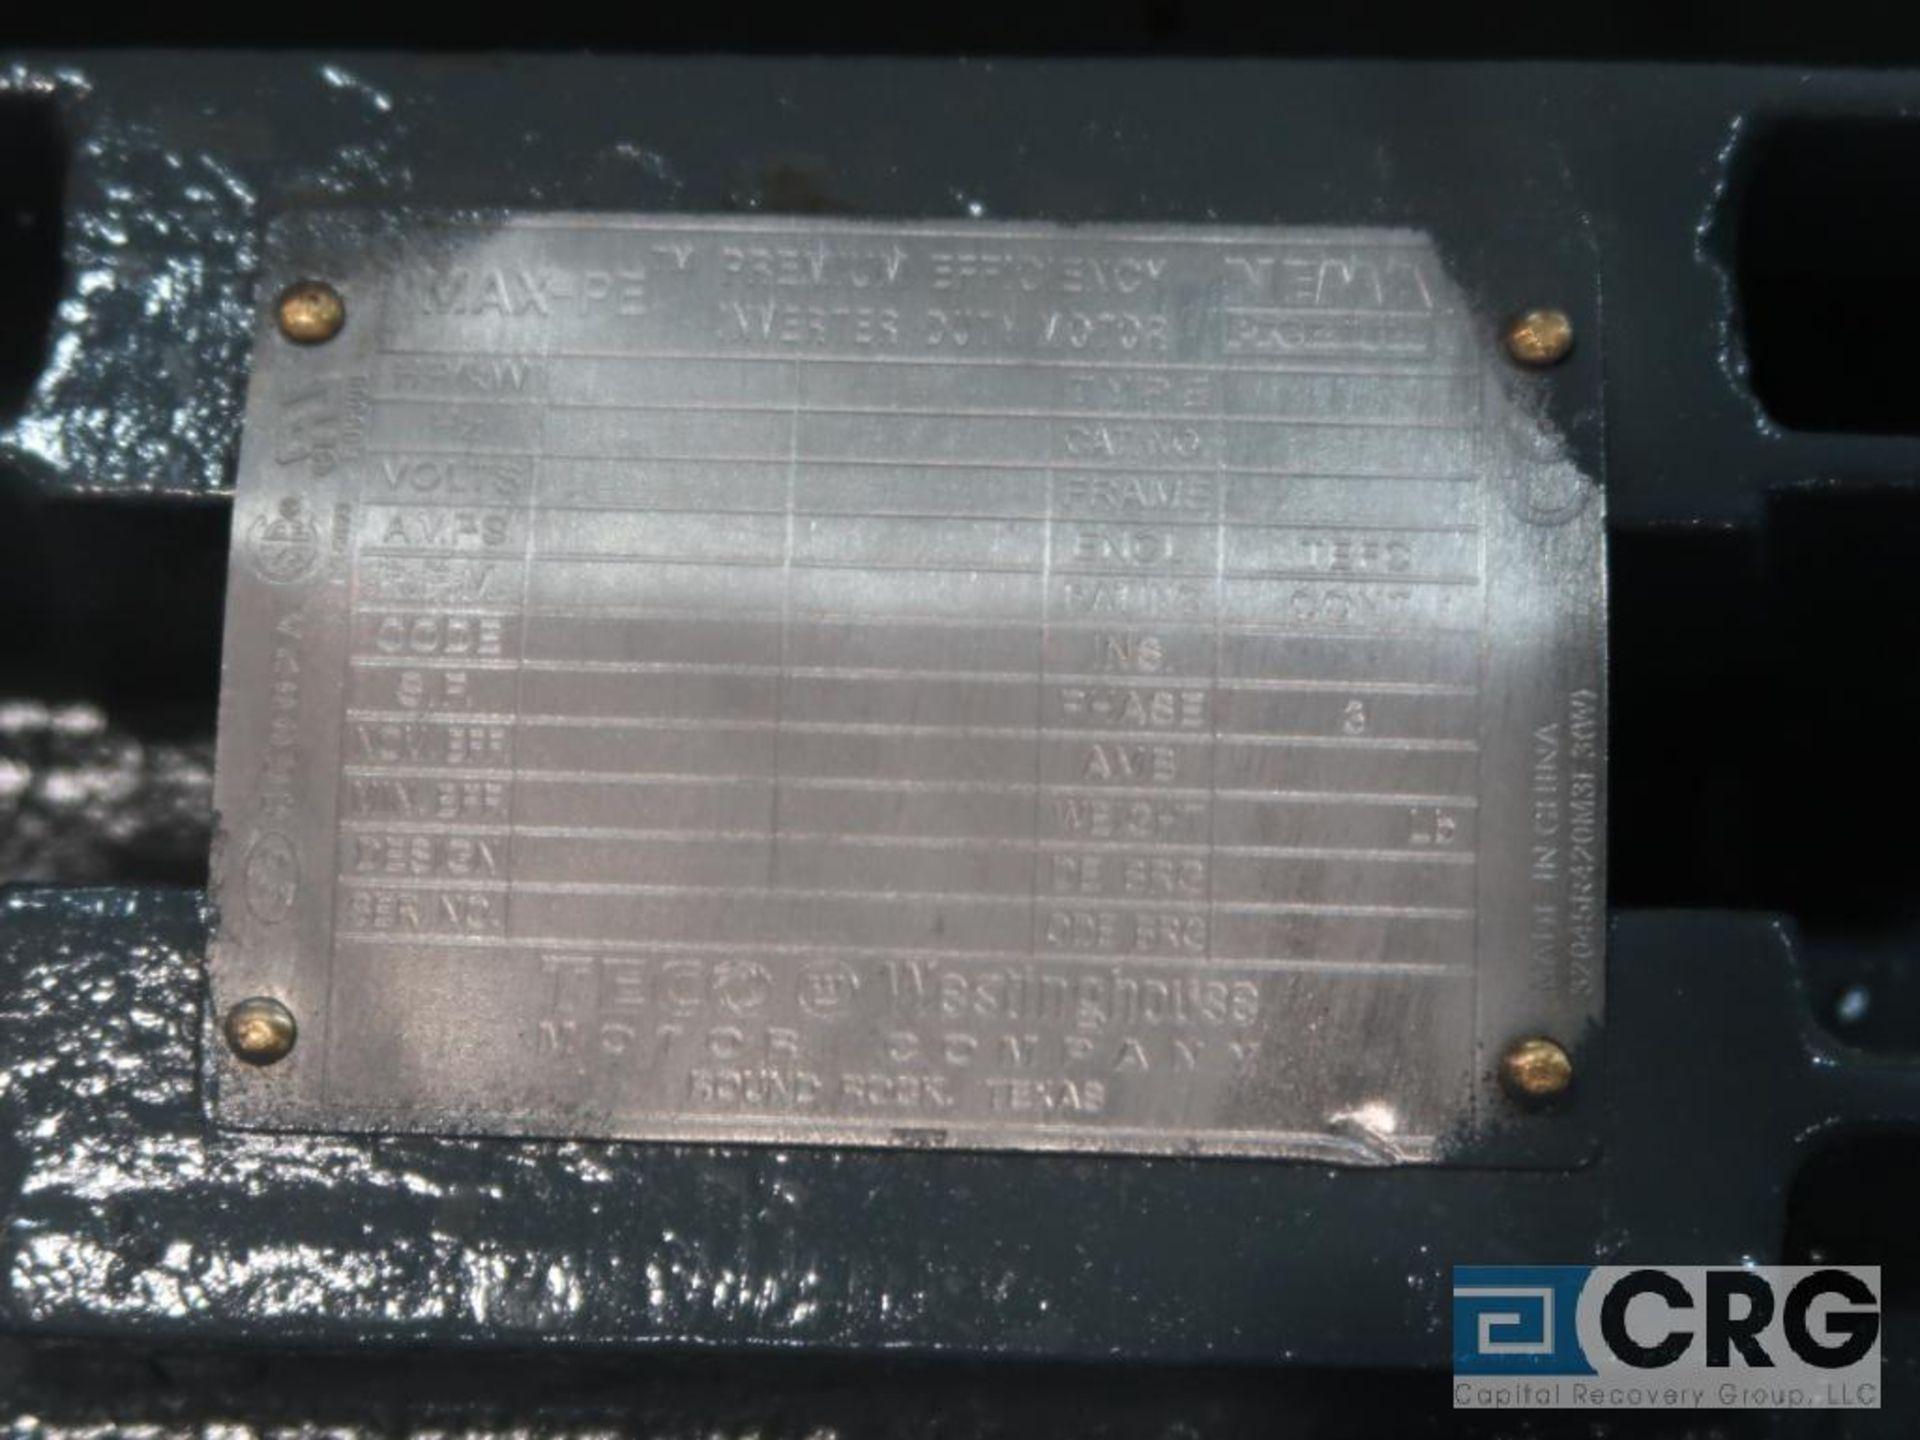 Teco Westinghouse MAX-PE Inverter Duty motor, 50 HP, 460 volt, 3 ph. (Finish Building) - Image 2 of 2